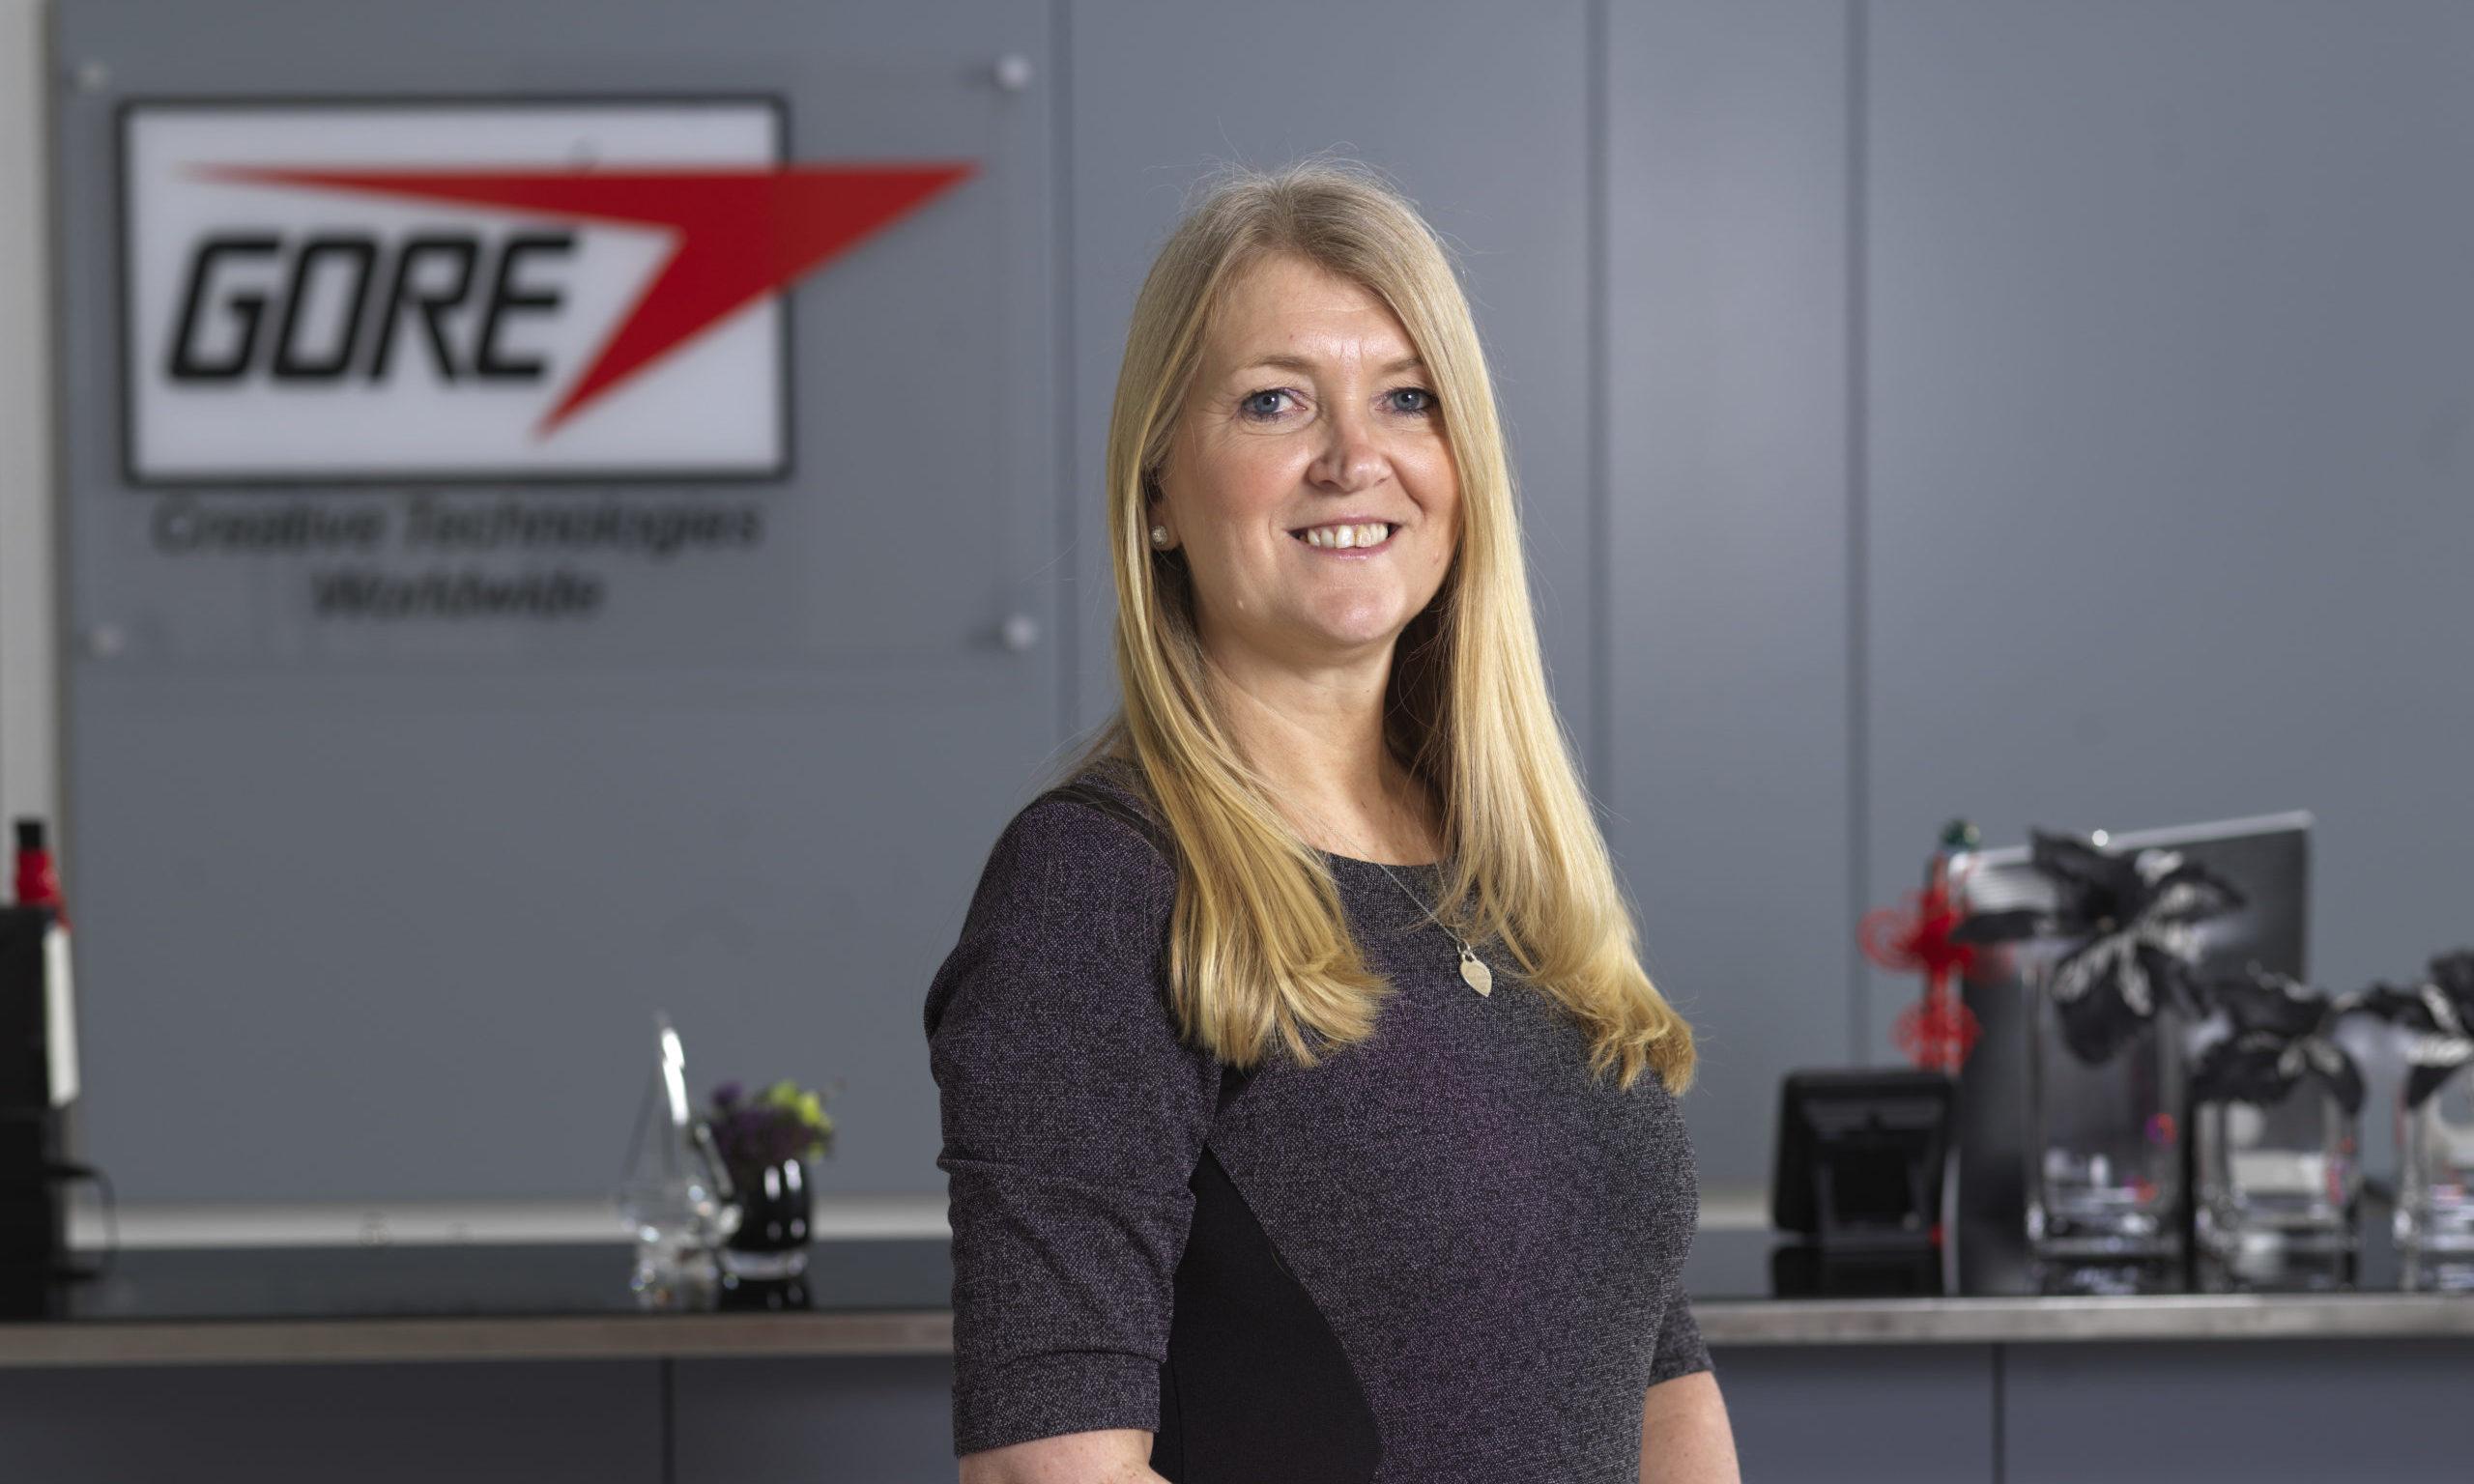 WL Gore plant leader Sheona Barlow